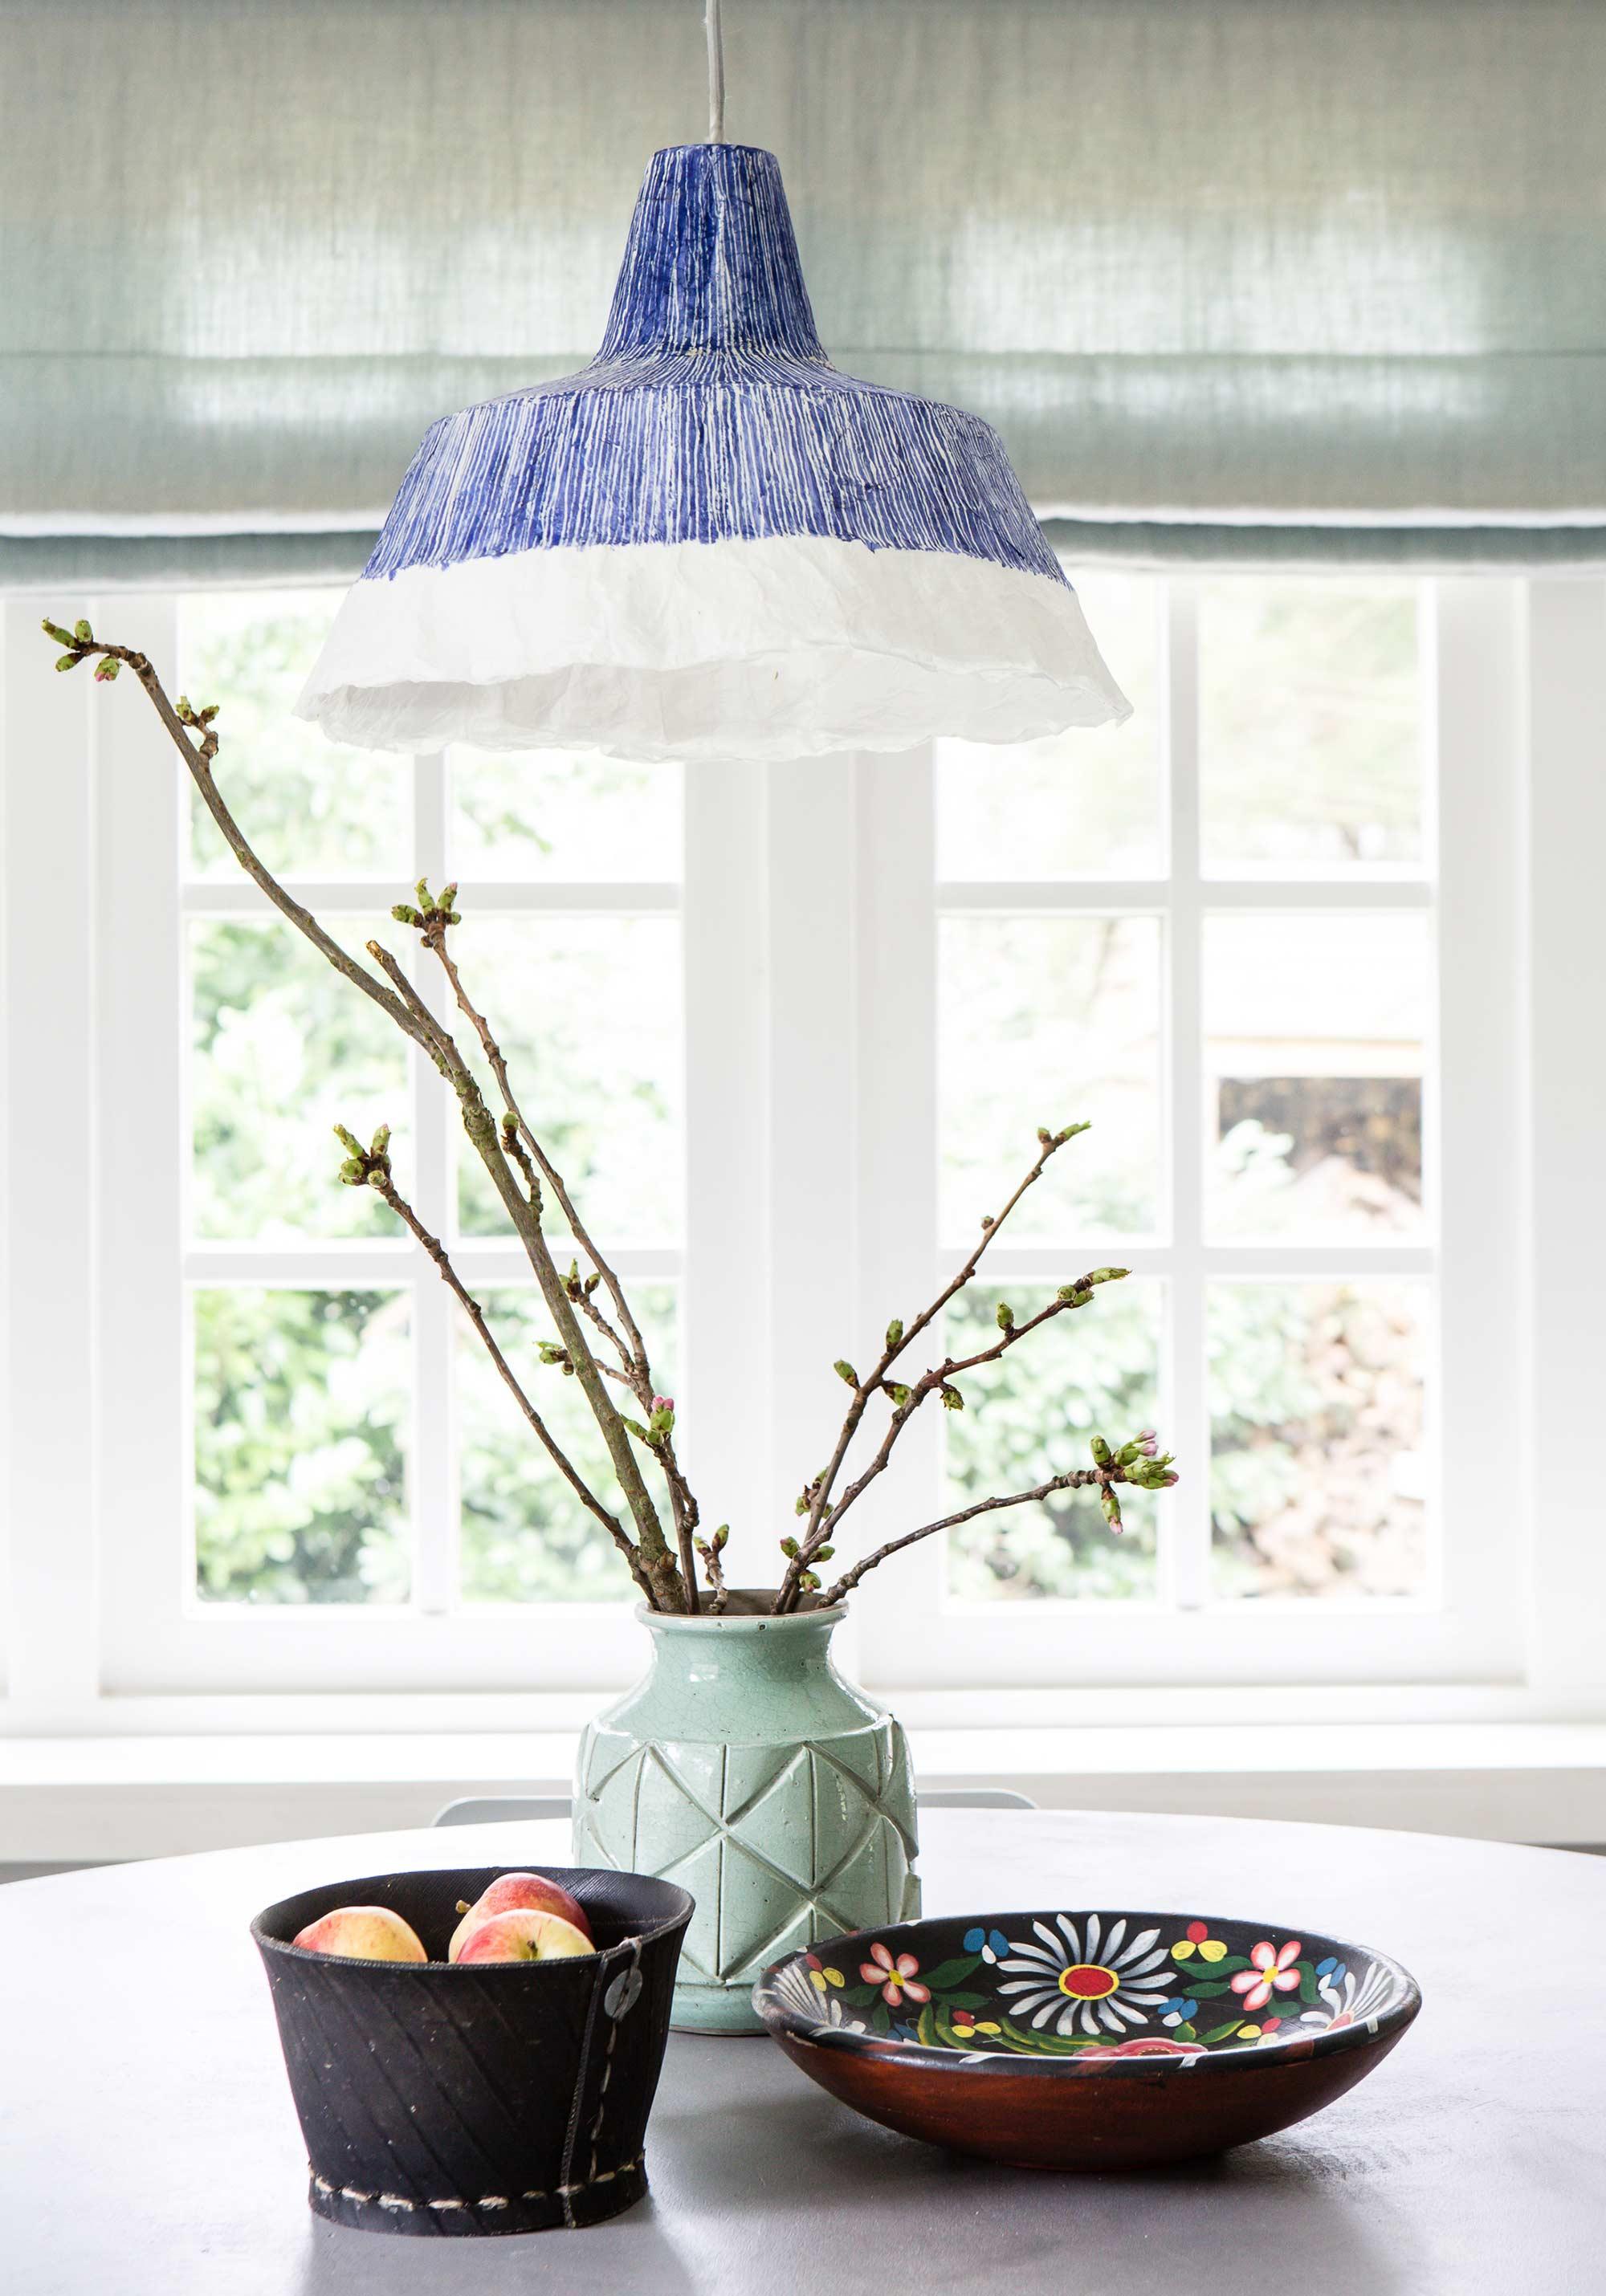 Papiermaché hanglamp